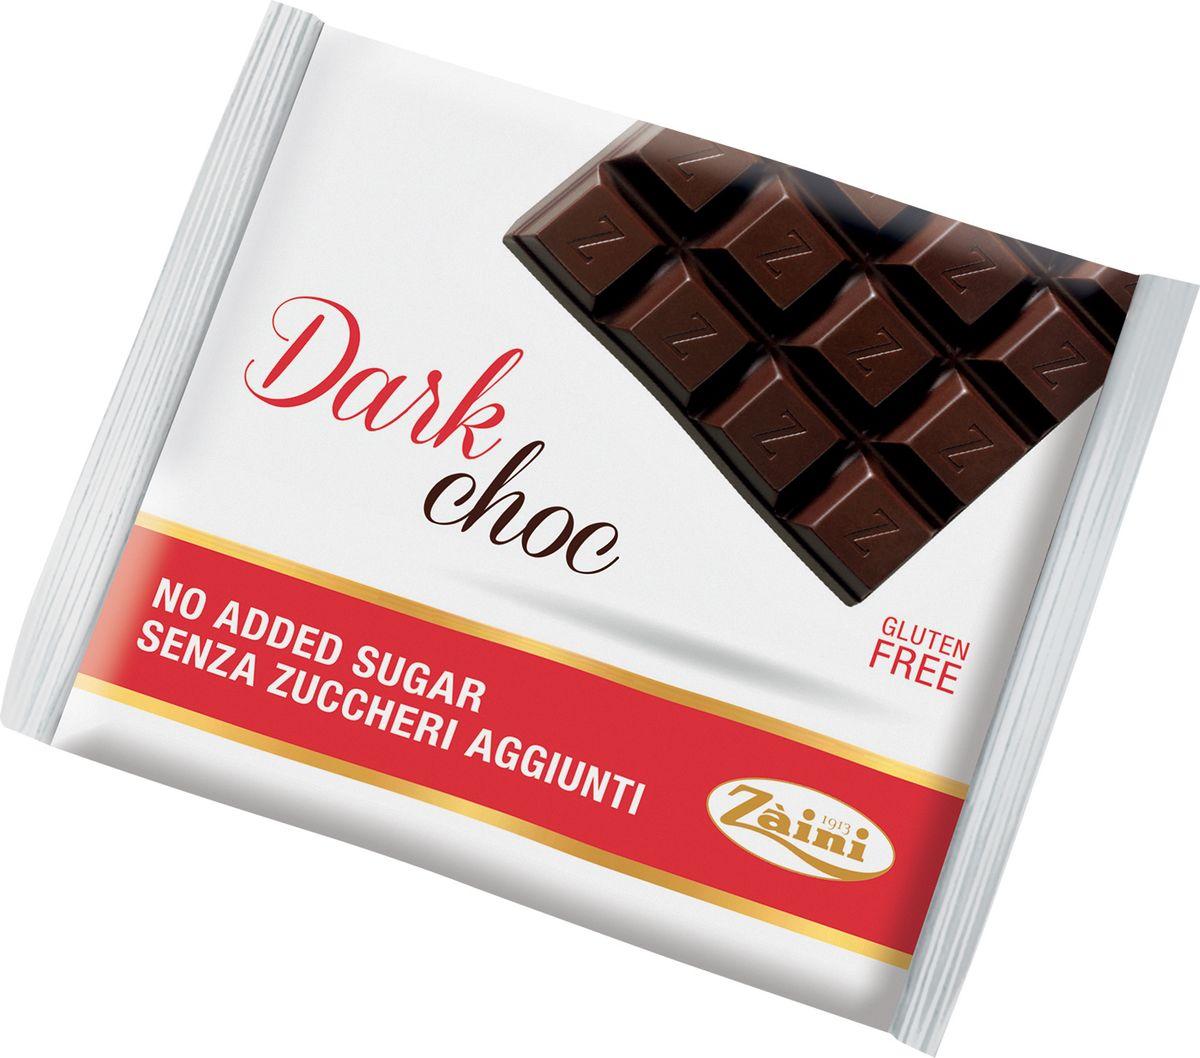 Zaini Dark Choc темный шоколад без сахара, 75 г волшебница золотой орех шоколад темный с миндалем 190 г